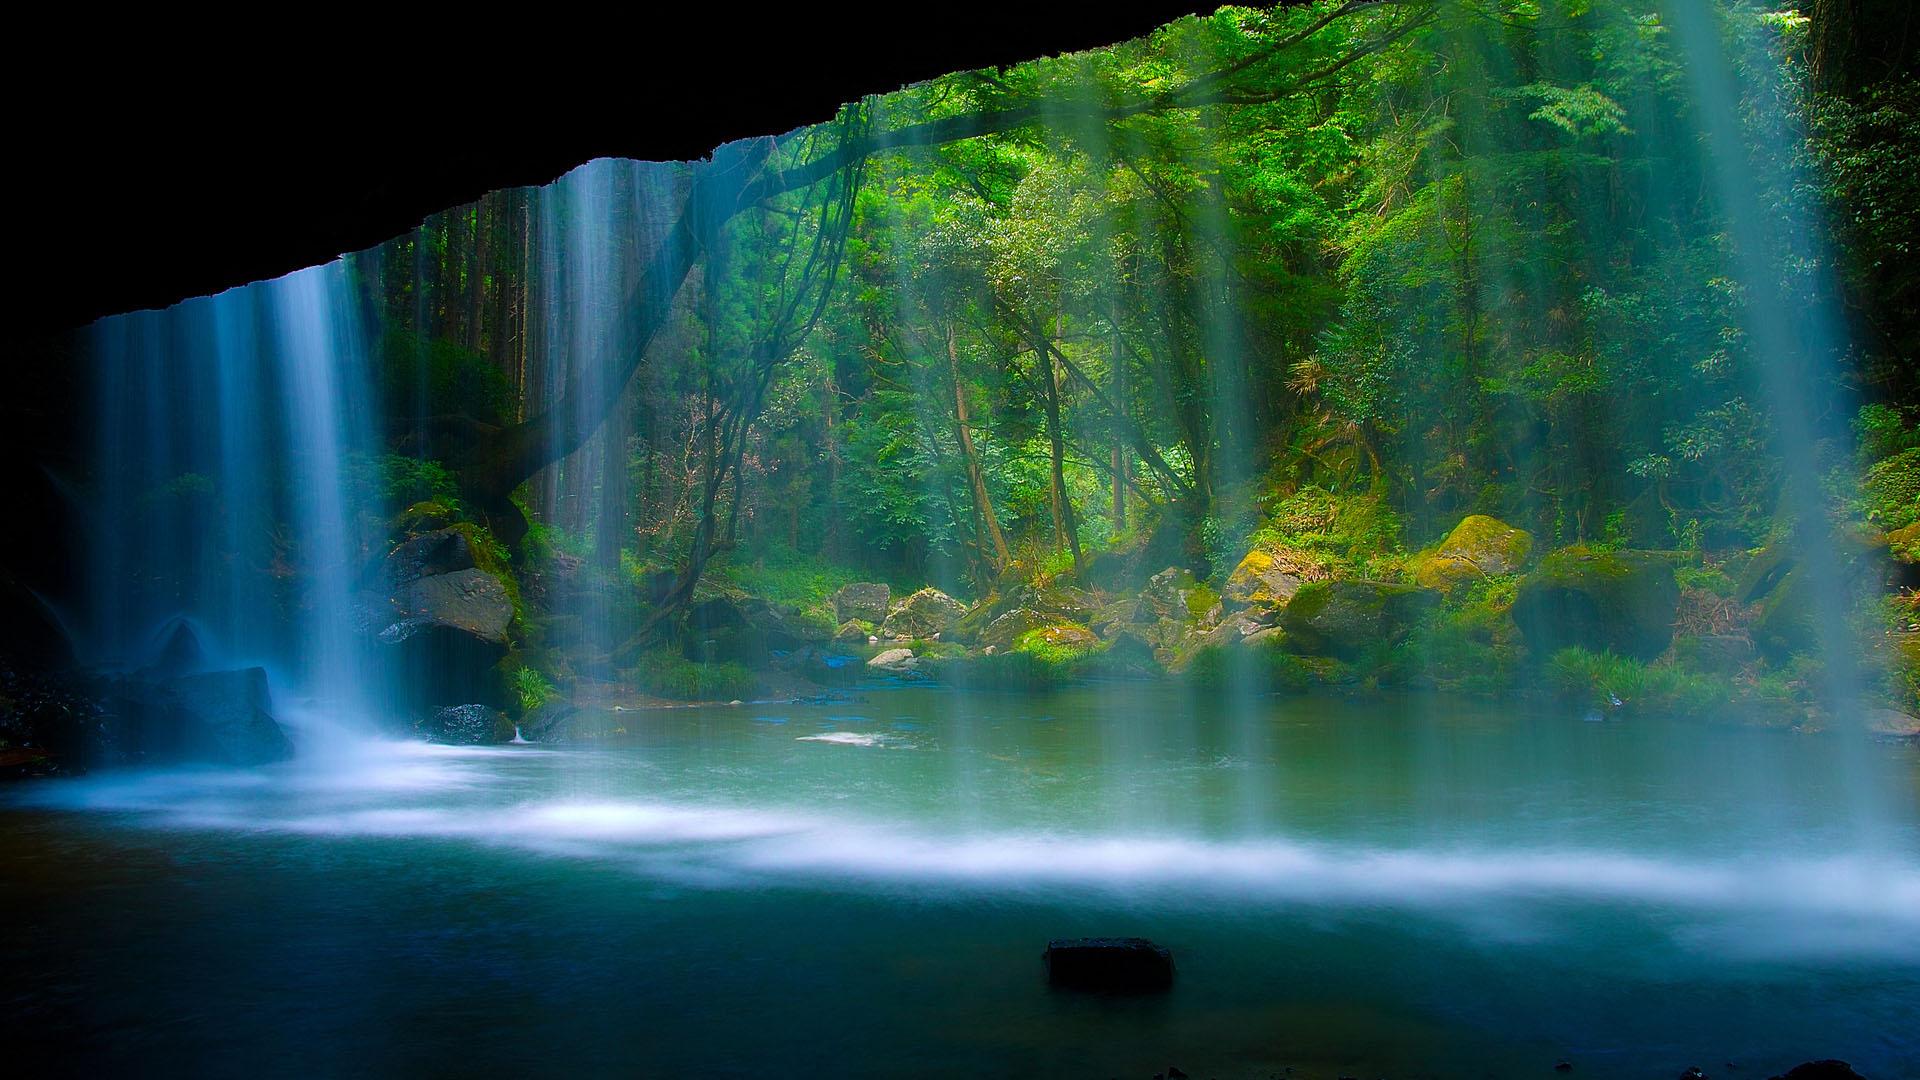 Beautiful mountain lake hd nature desktop wallpapers 1920x1080 1920x1080